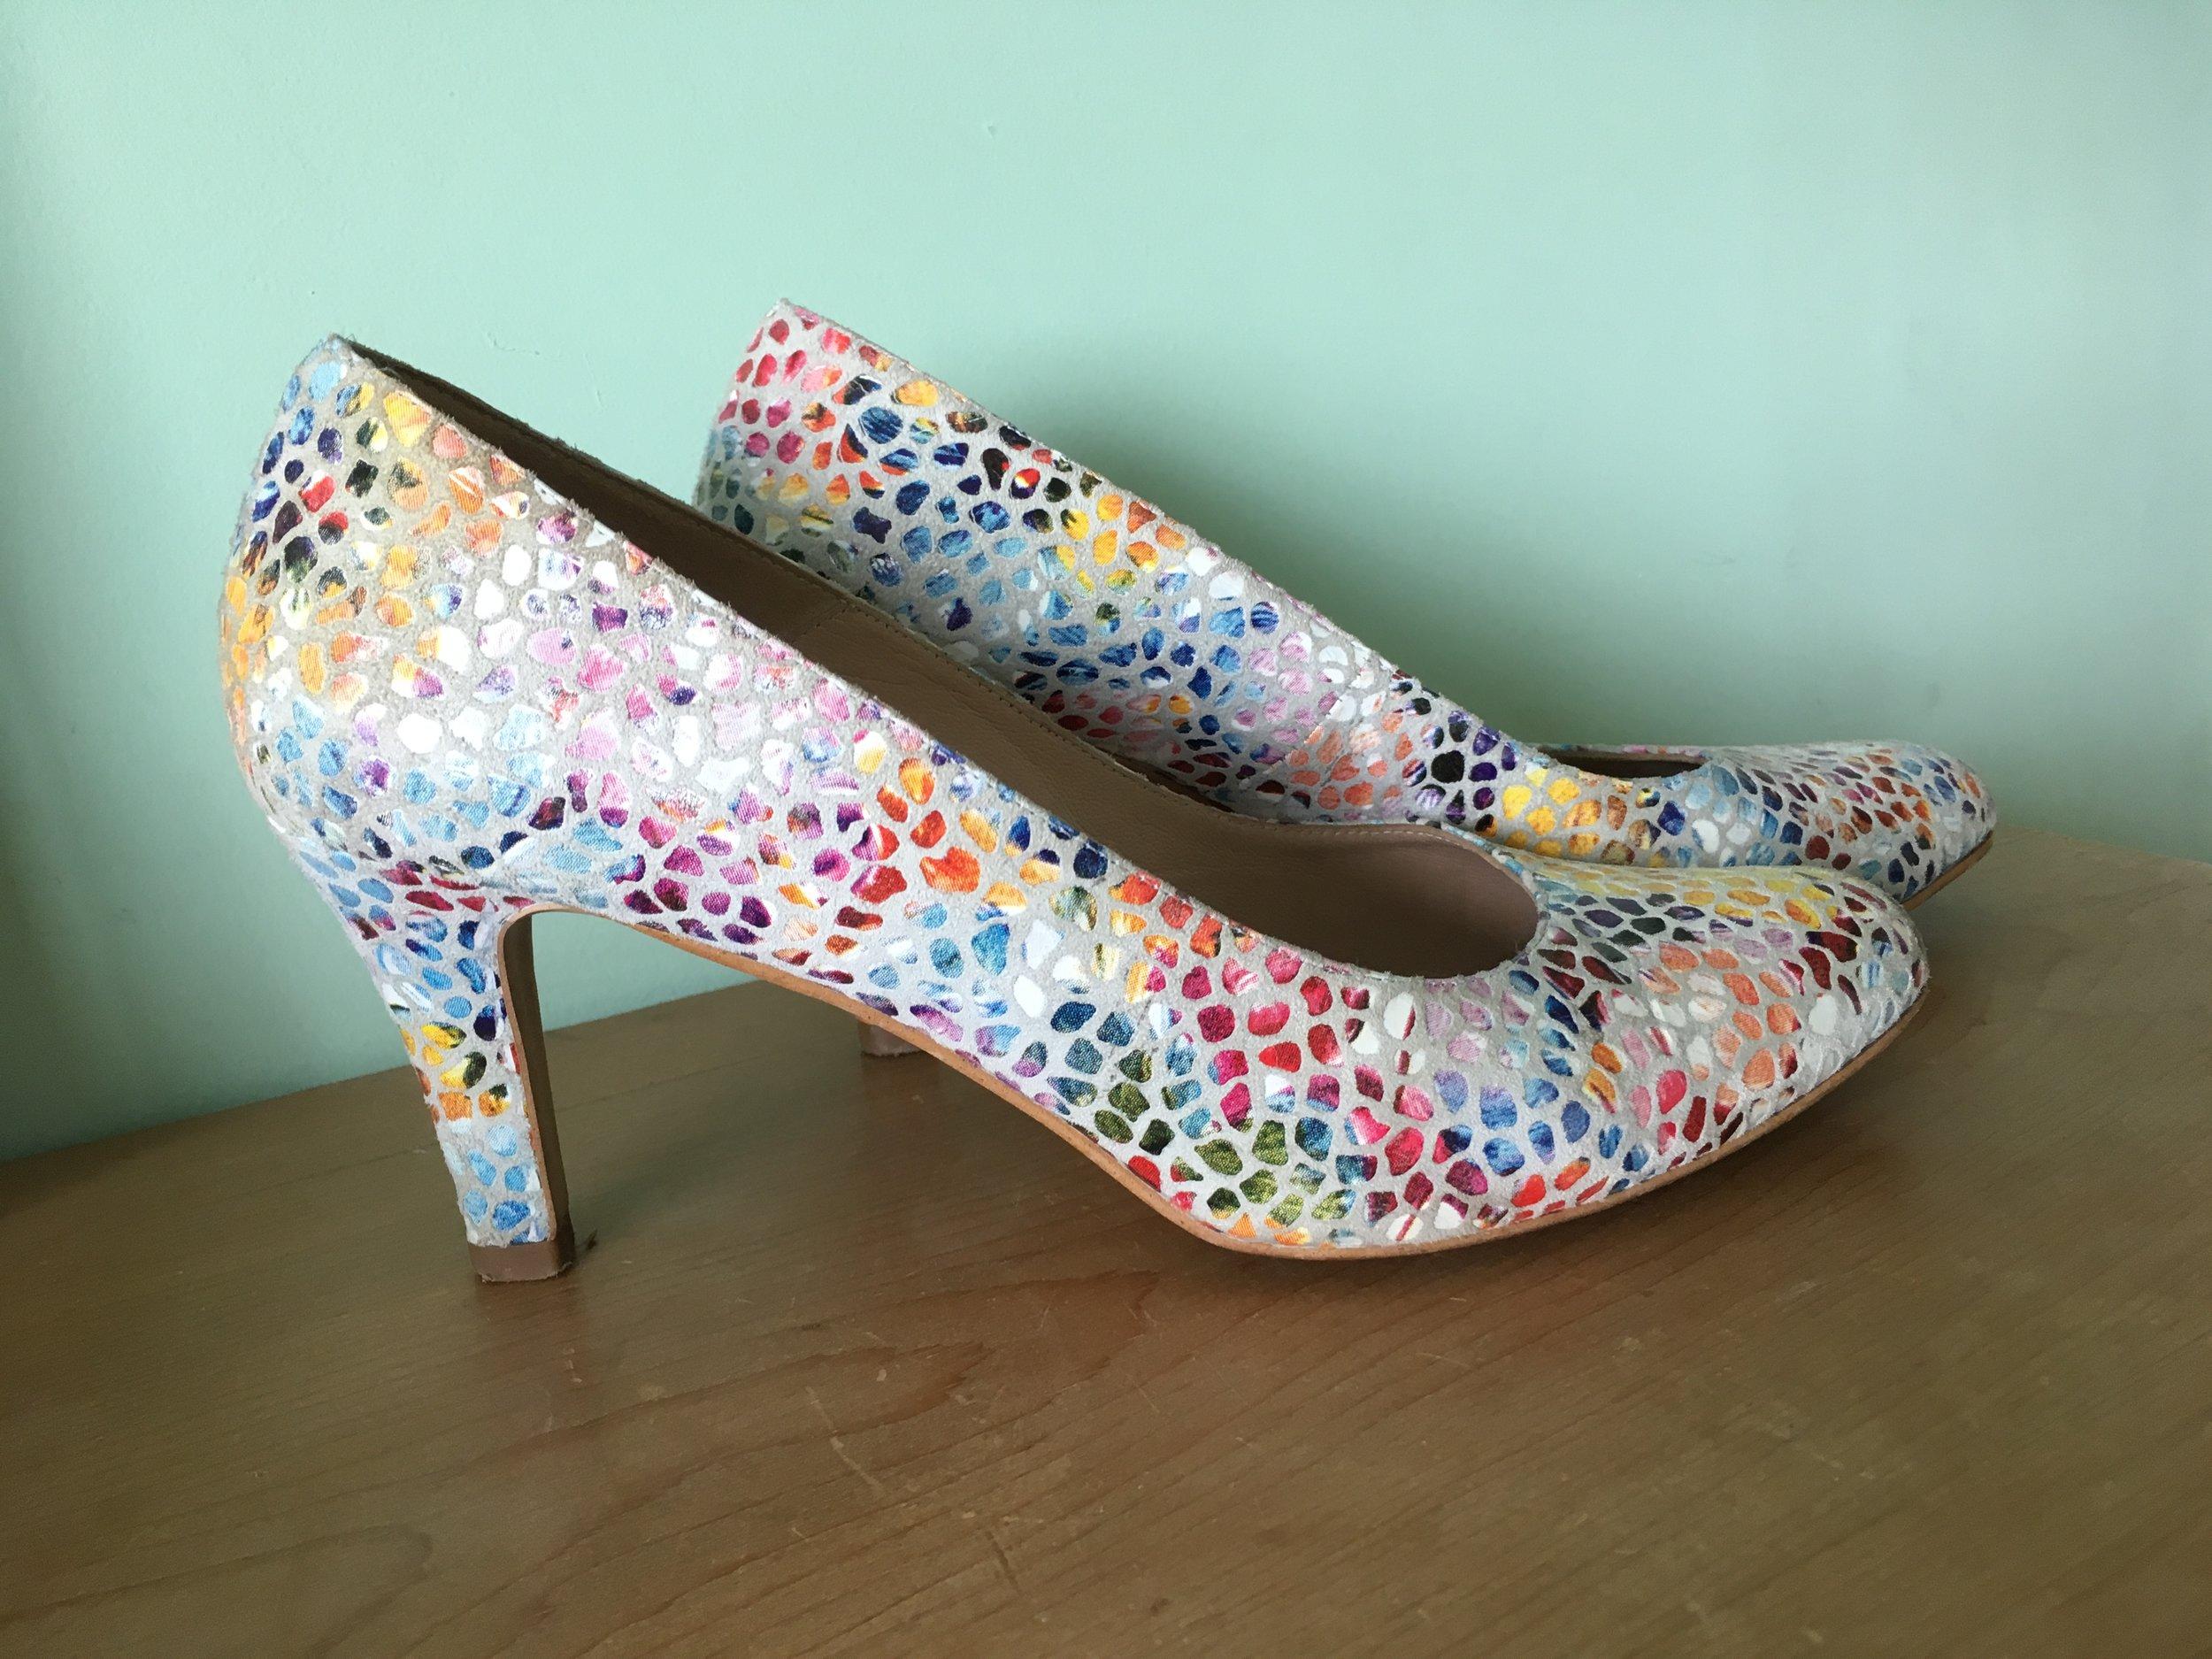 shoes photo.JPG